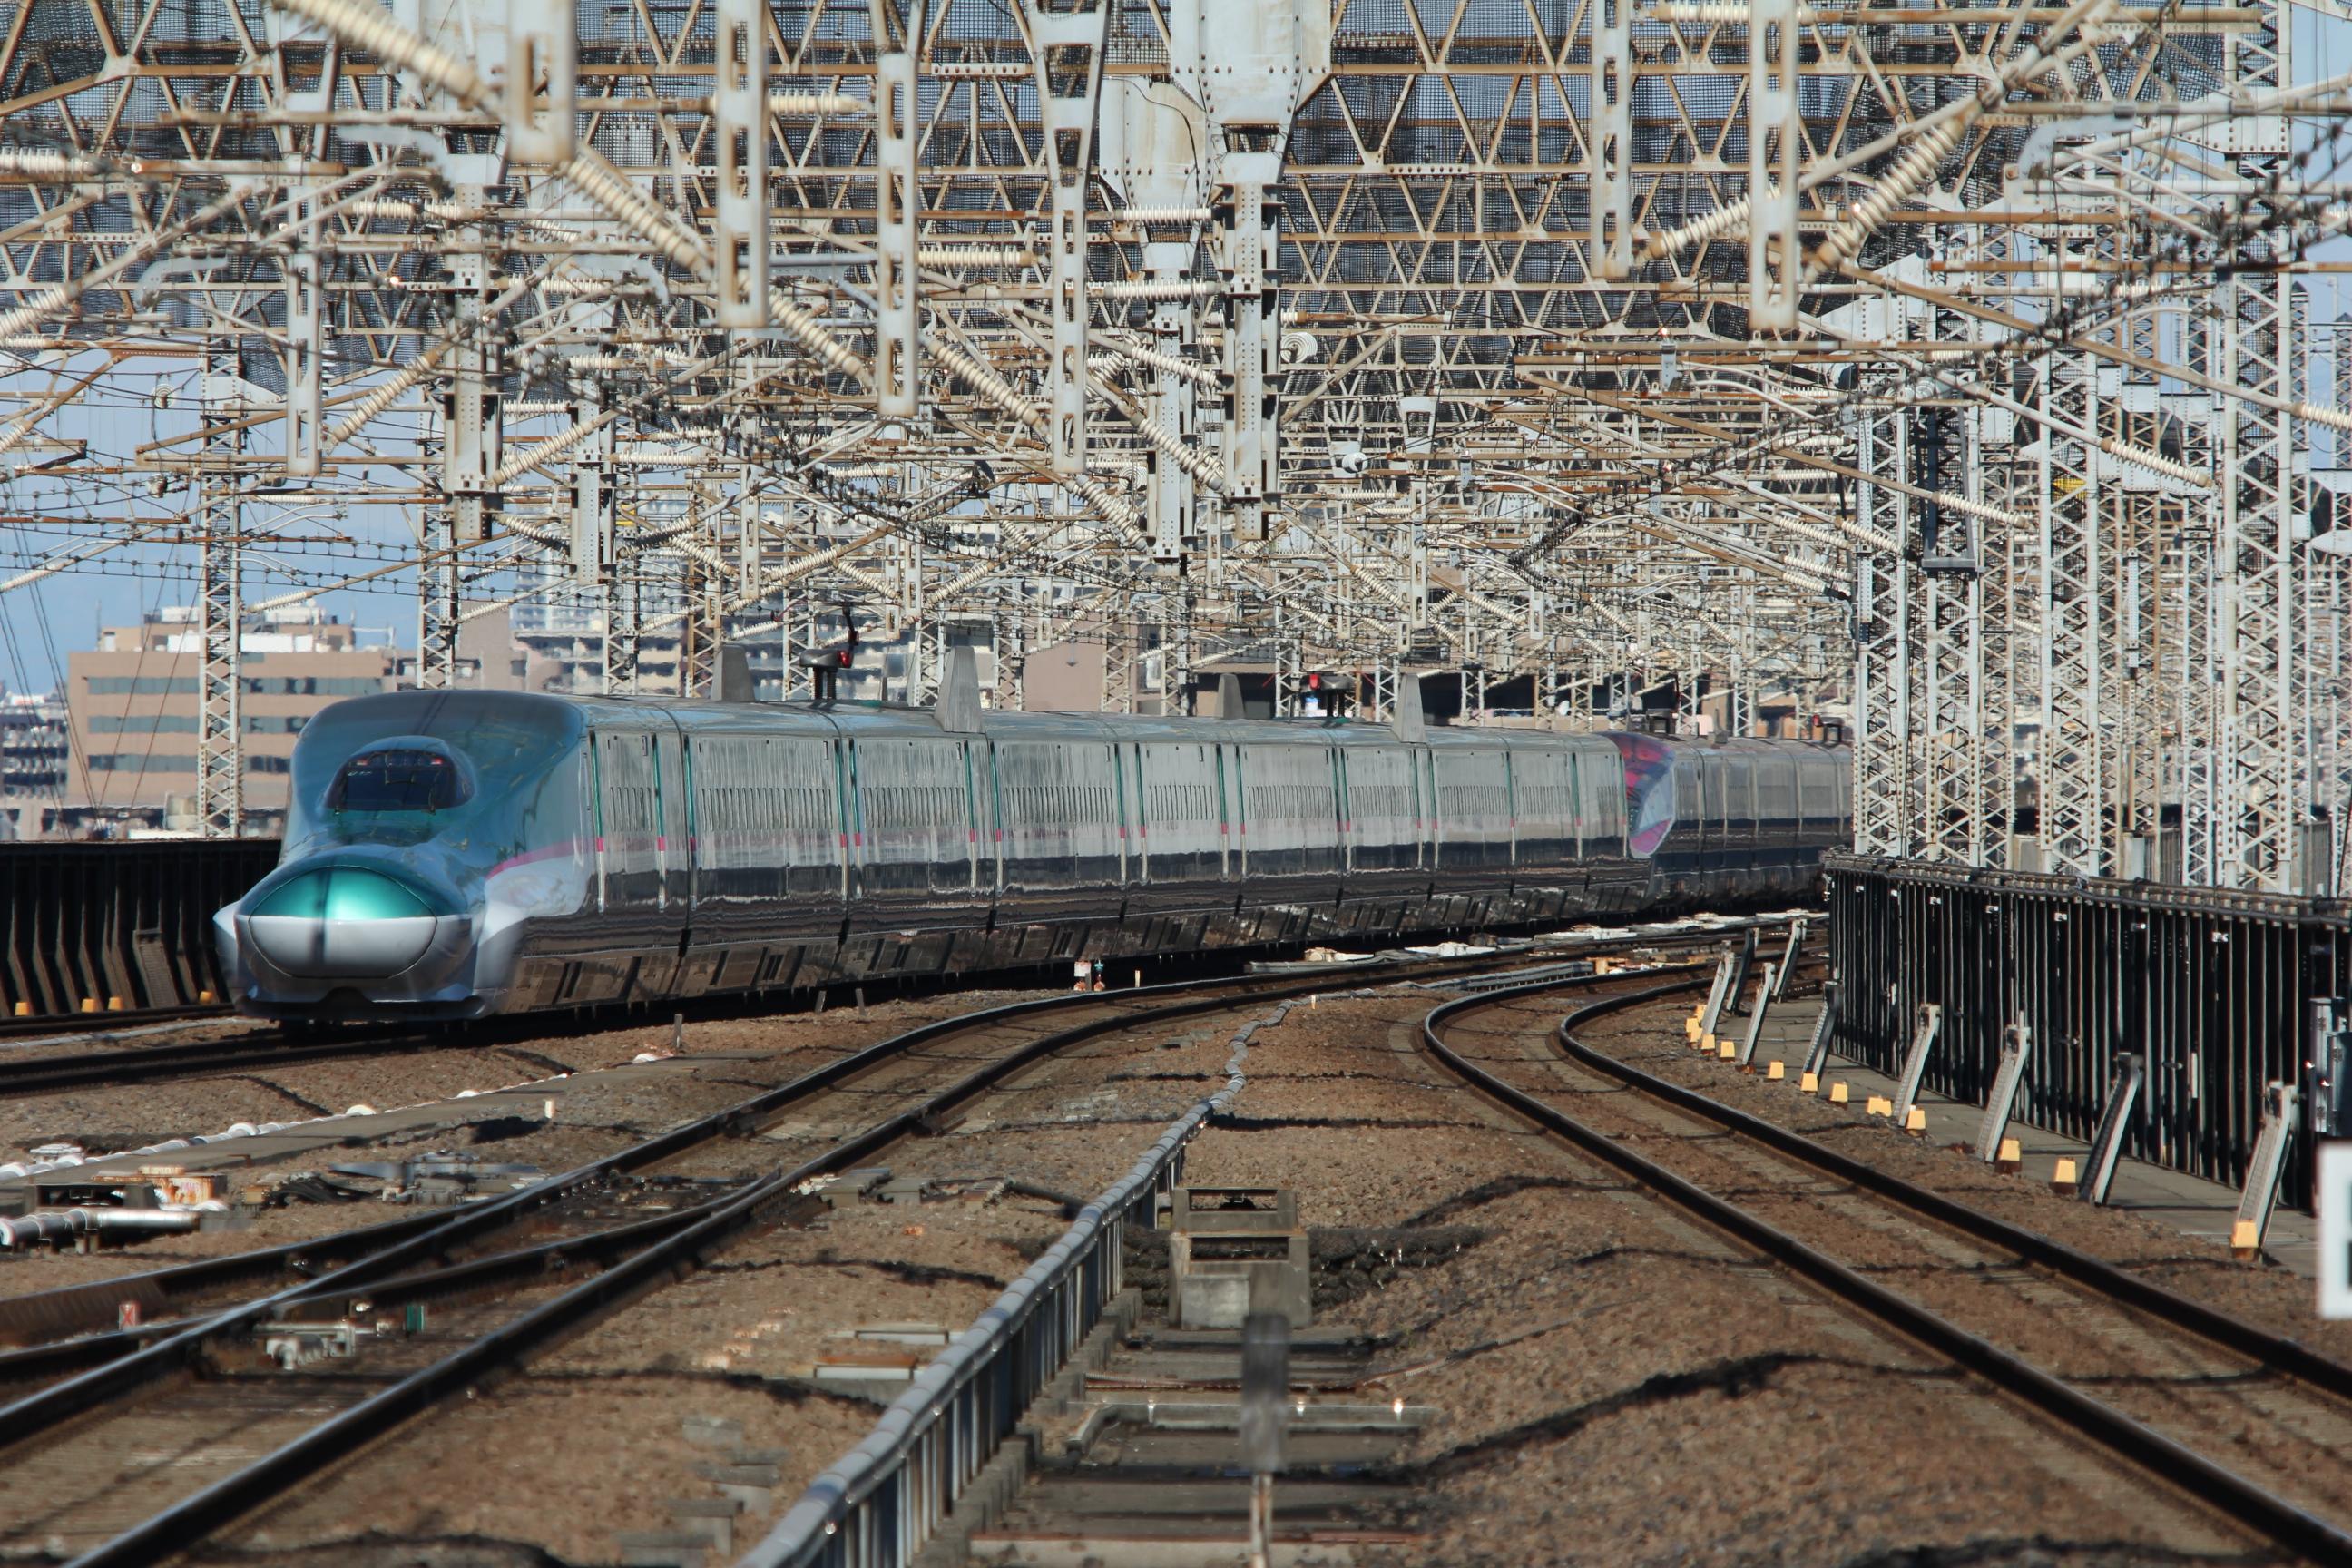 http://shimousasougou.sakura.ne.jp/blog/wp-content/uploads/2016/02/IMG_4758.jpg